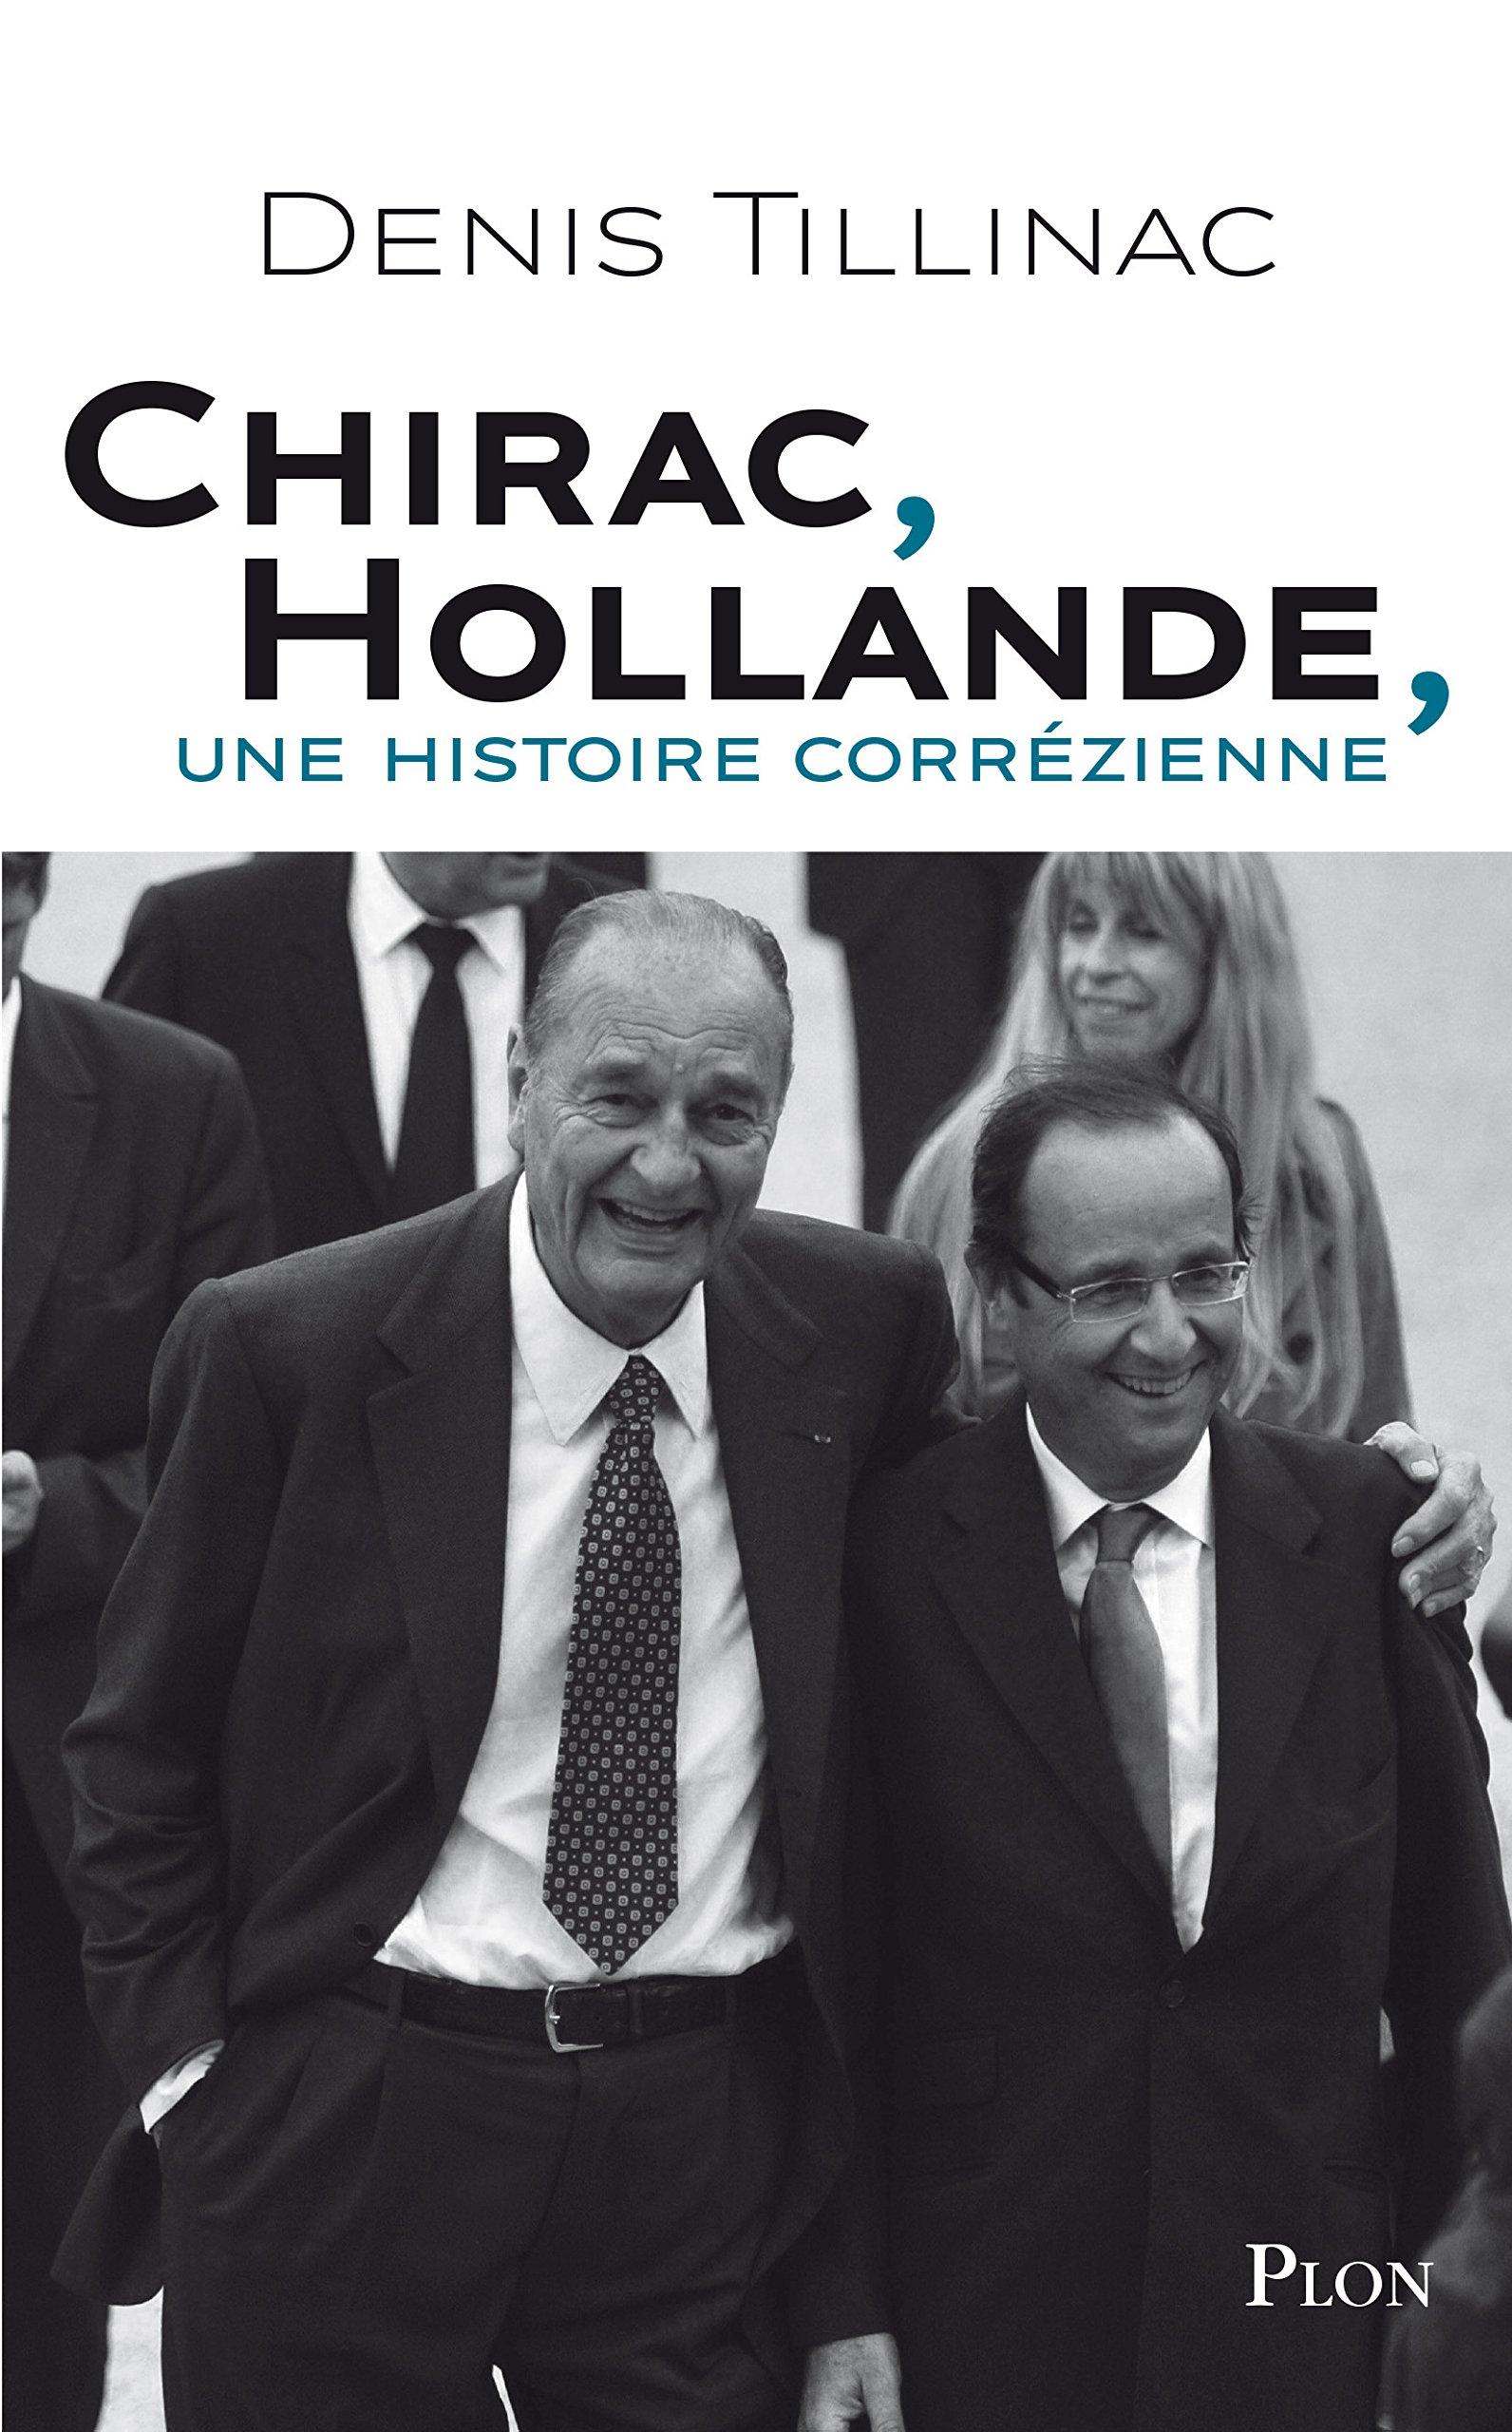 Chirac-Hollande, une histoire correzienne - Denis Tillinac